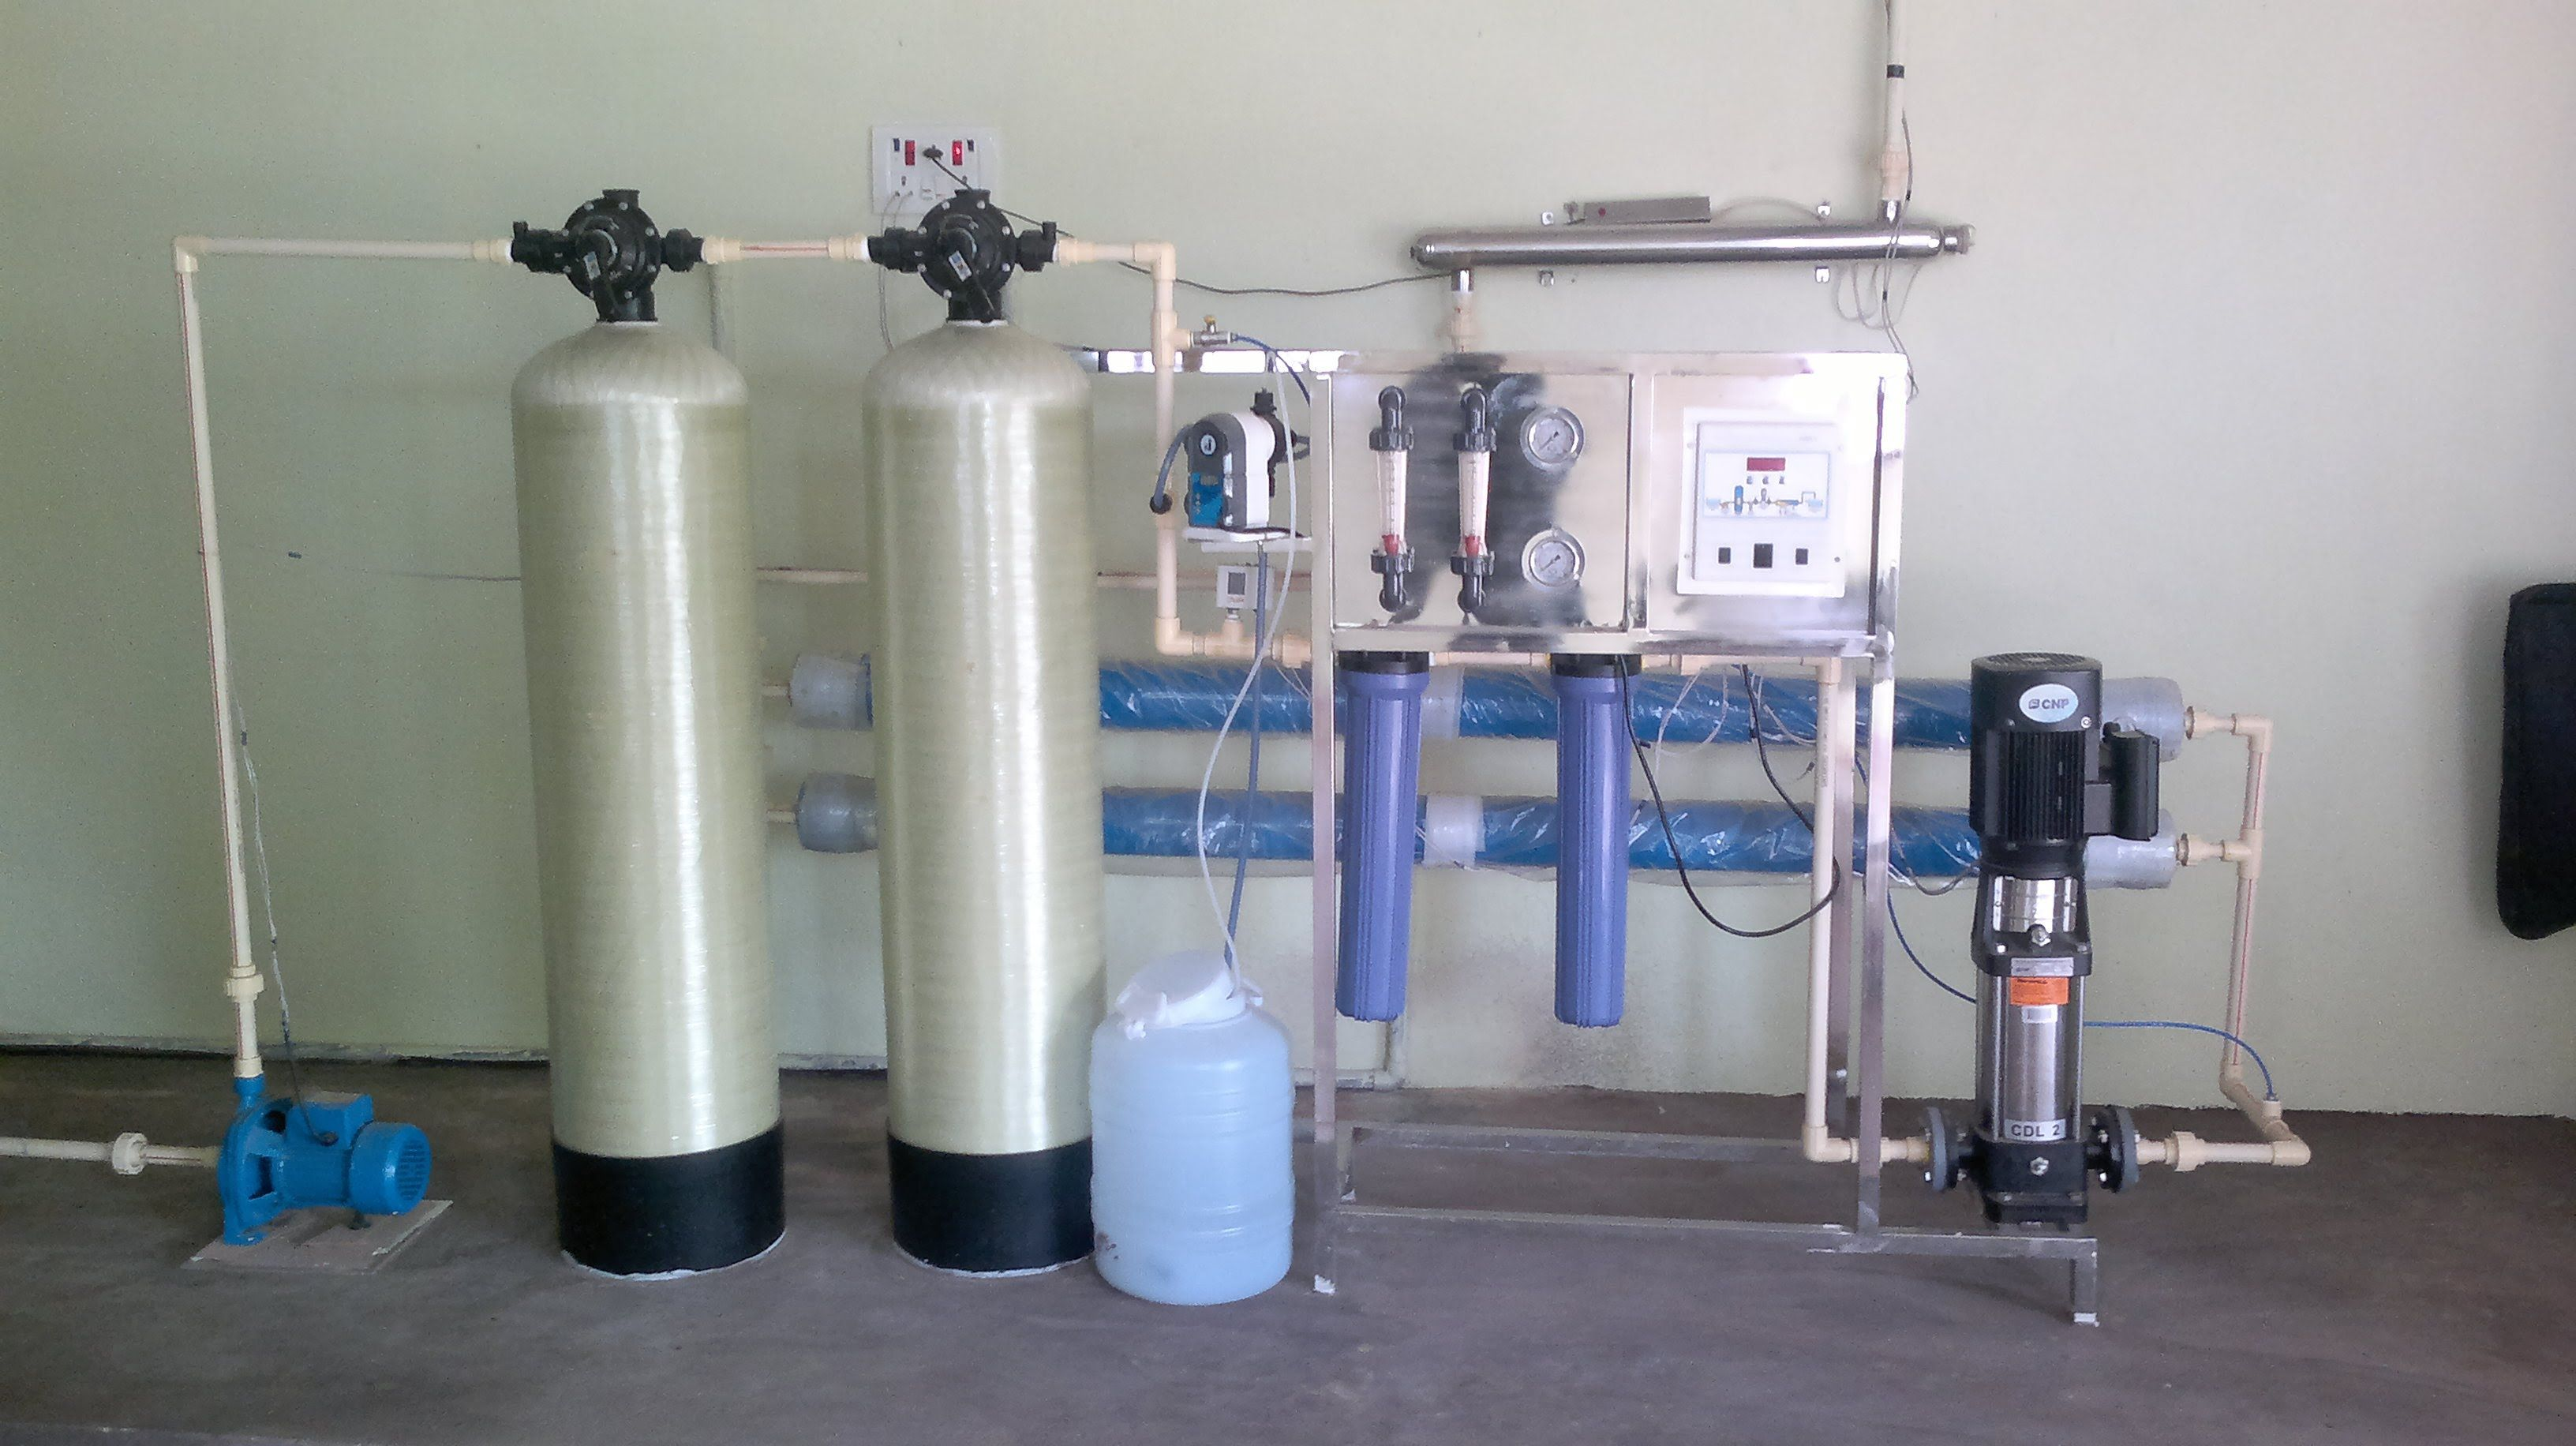 1000 Semi Automatic Liter per hour RO Reverse Osmosis